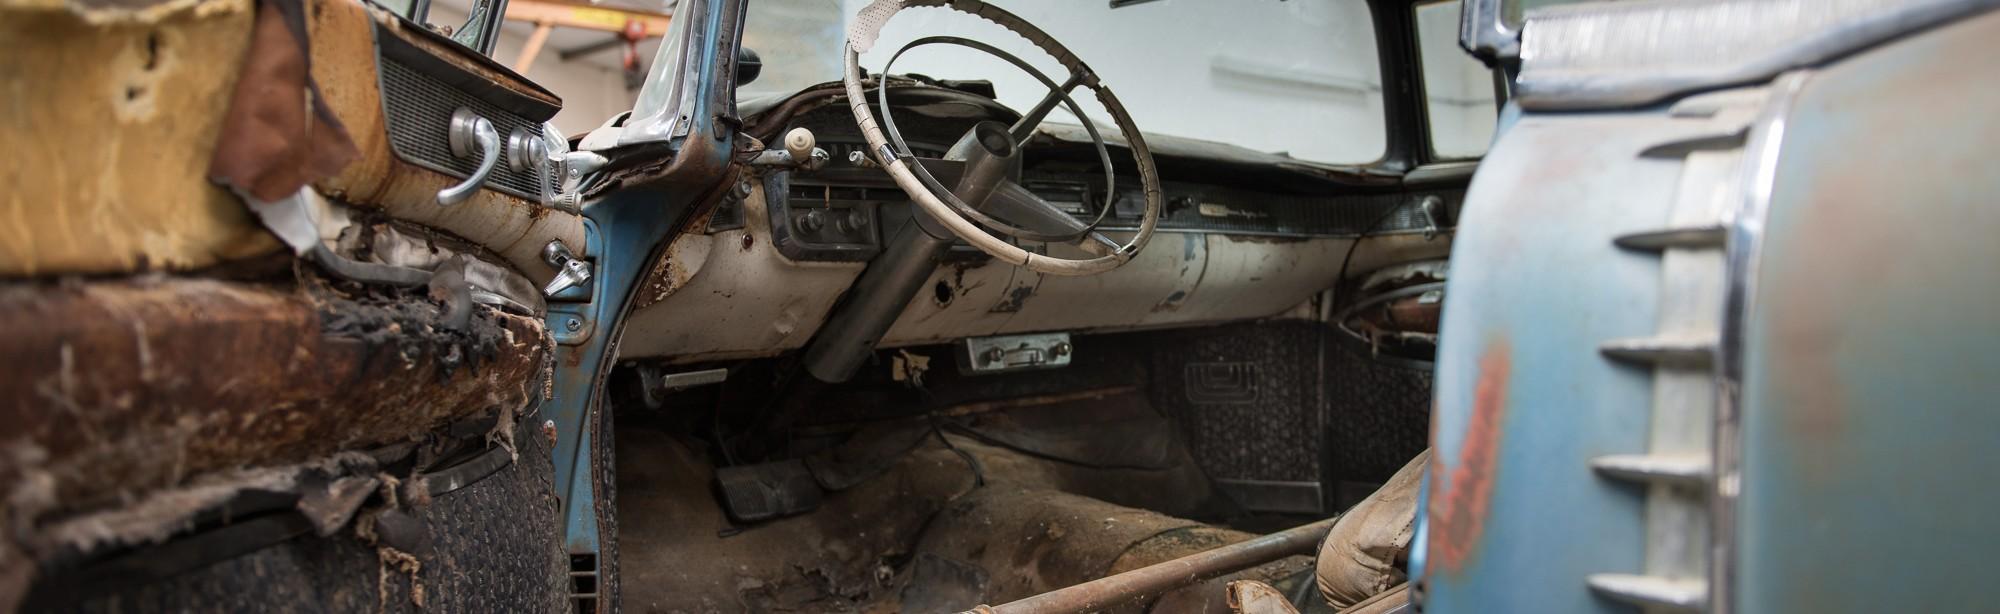 Unrestored 1956 Cadillac